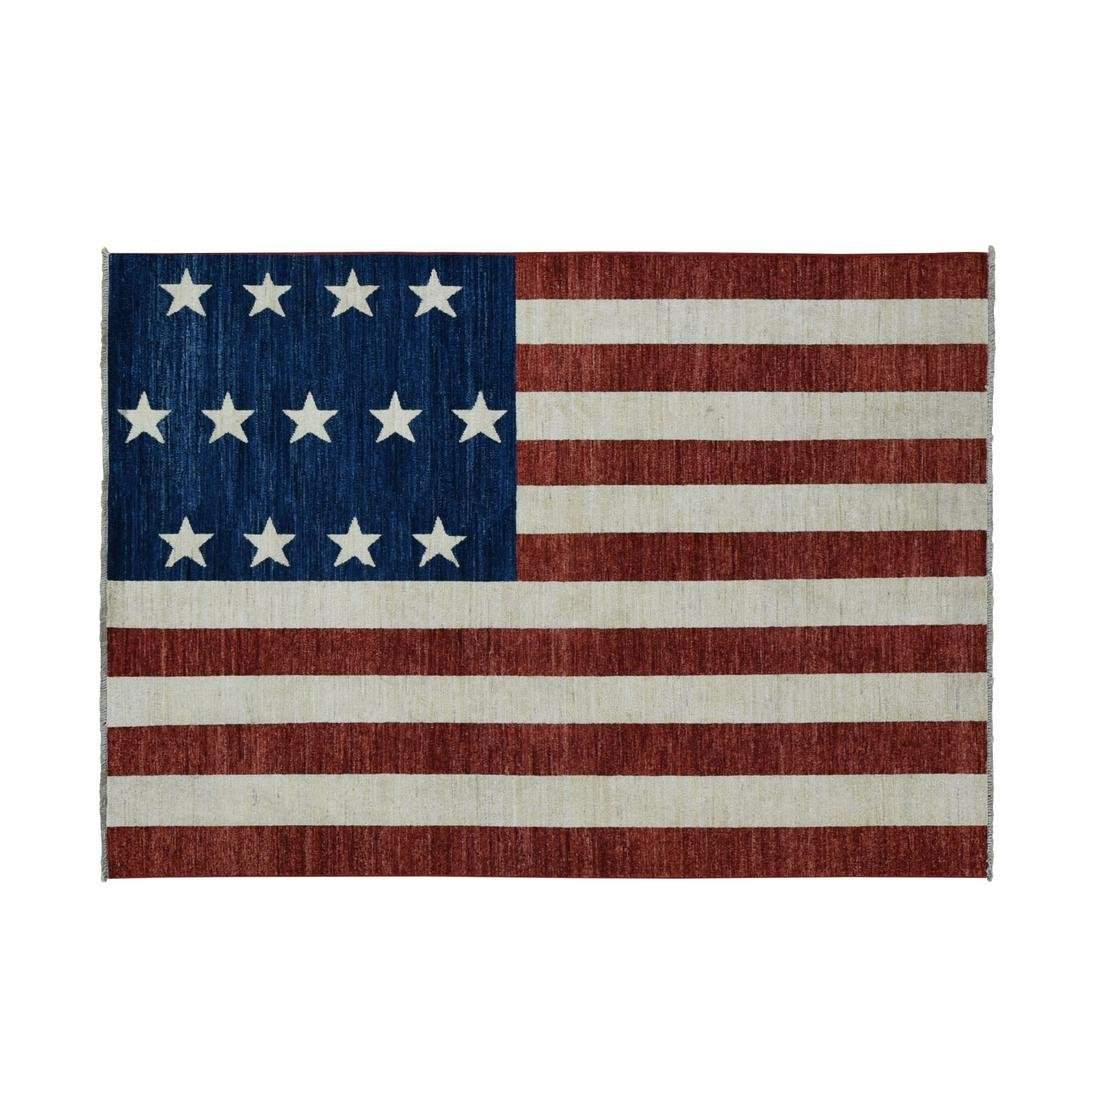 Pure Wool Vintage Hand-Knotted Civil War Design Flag